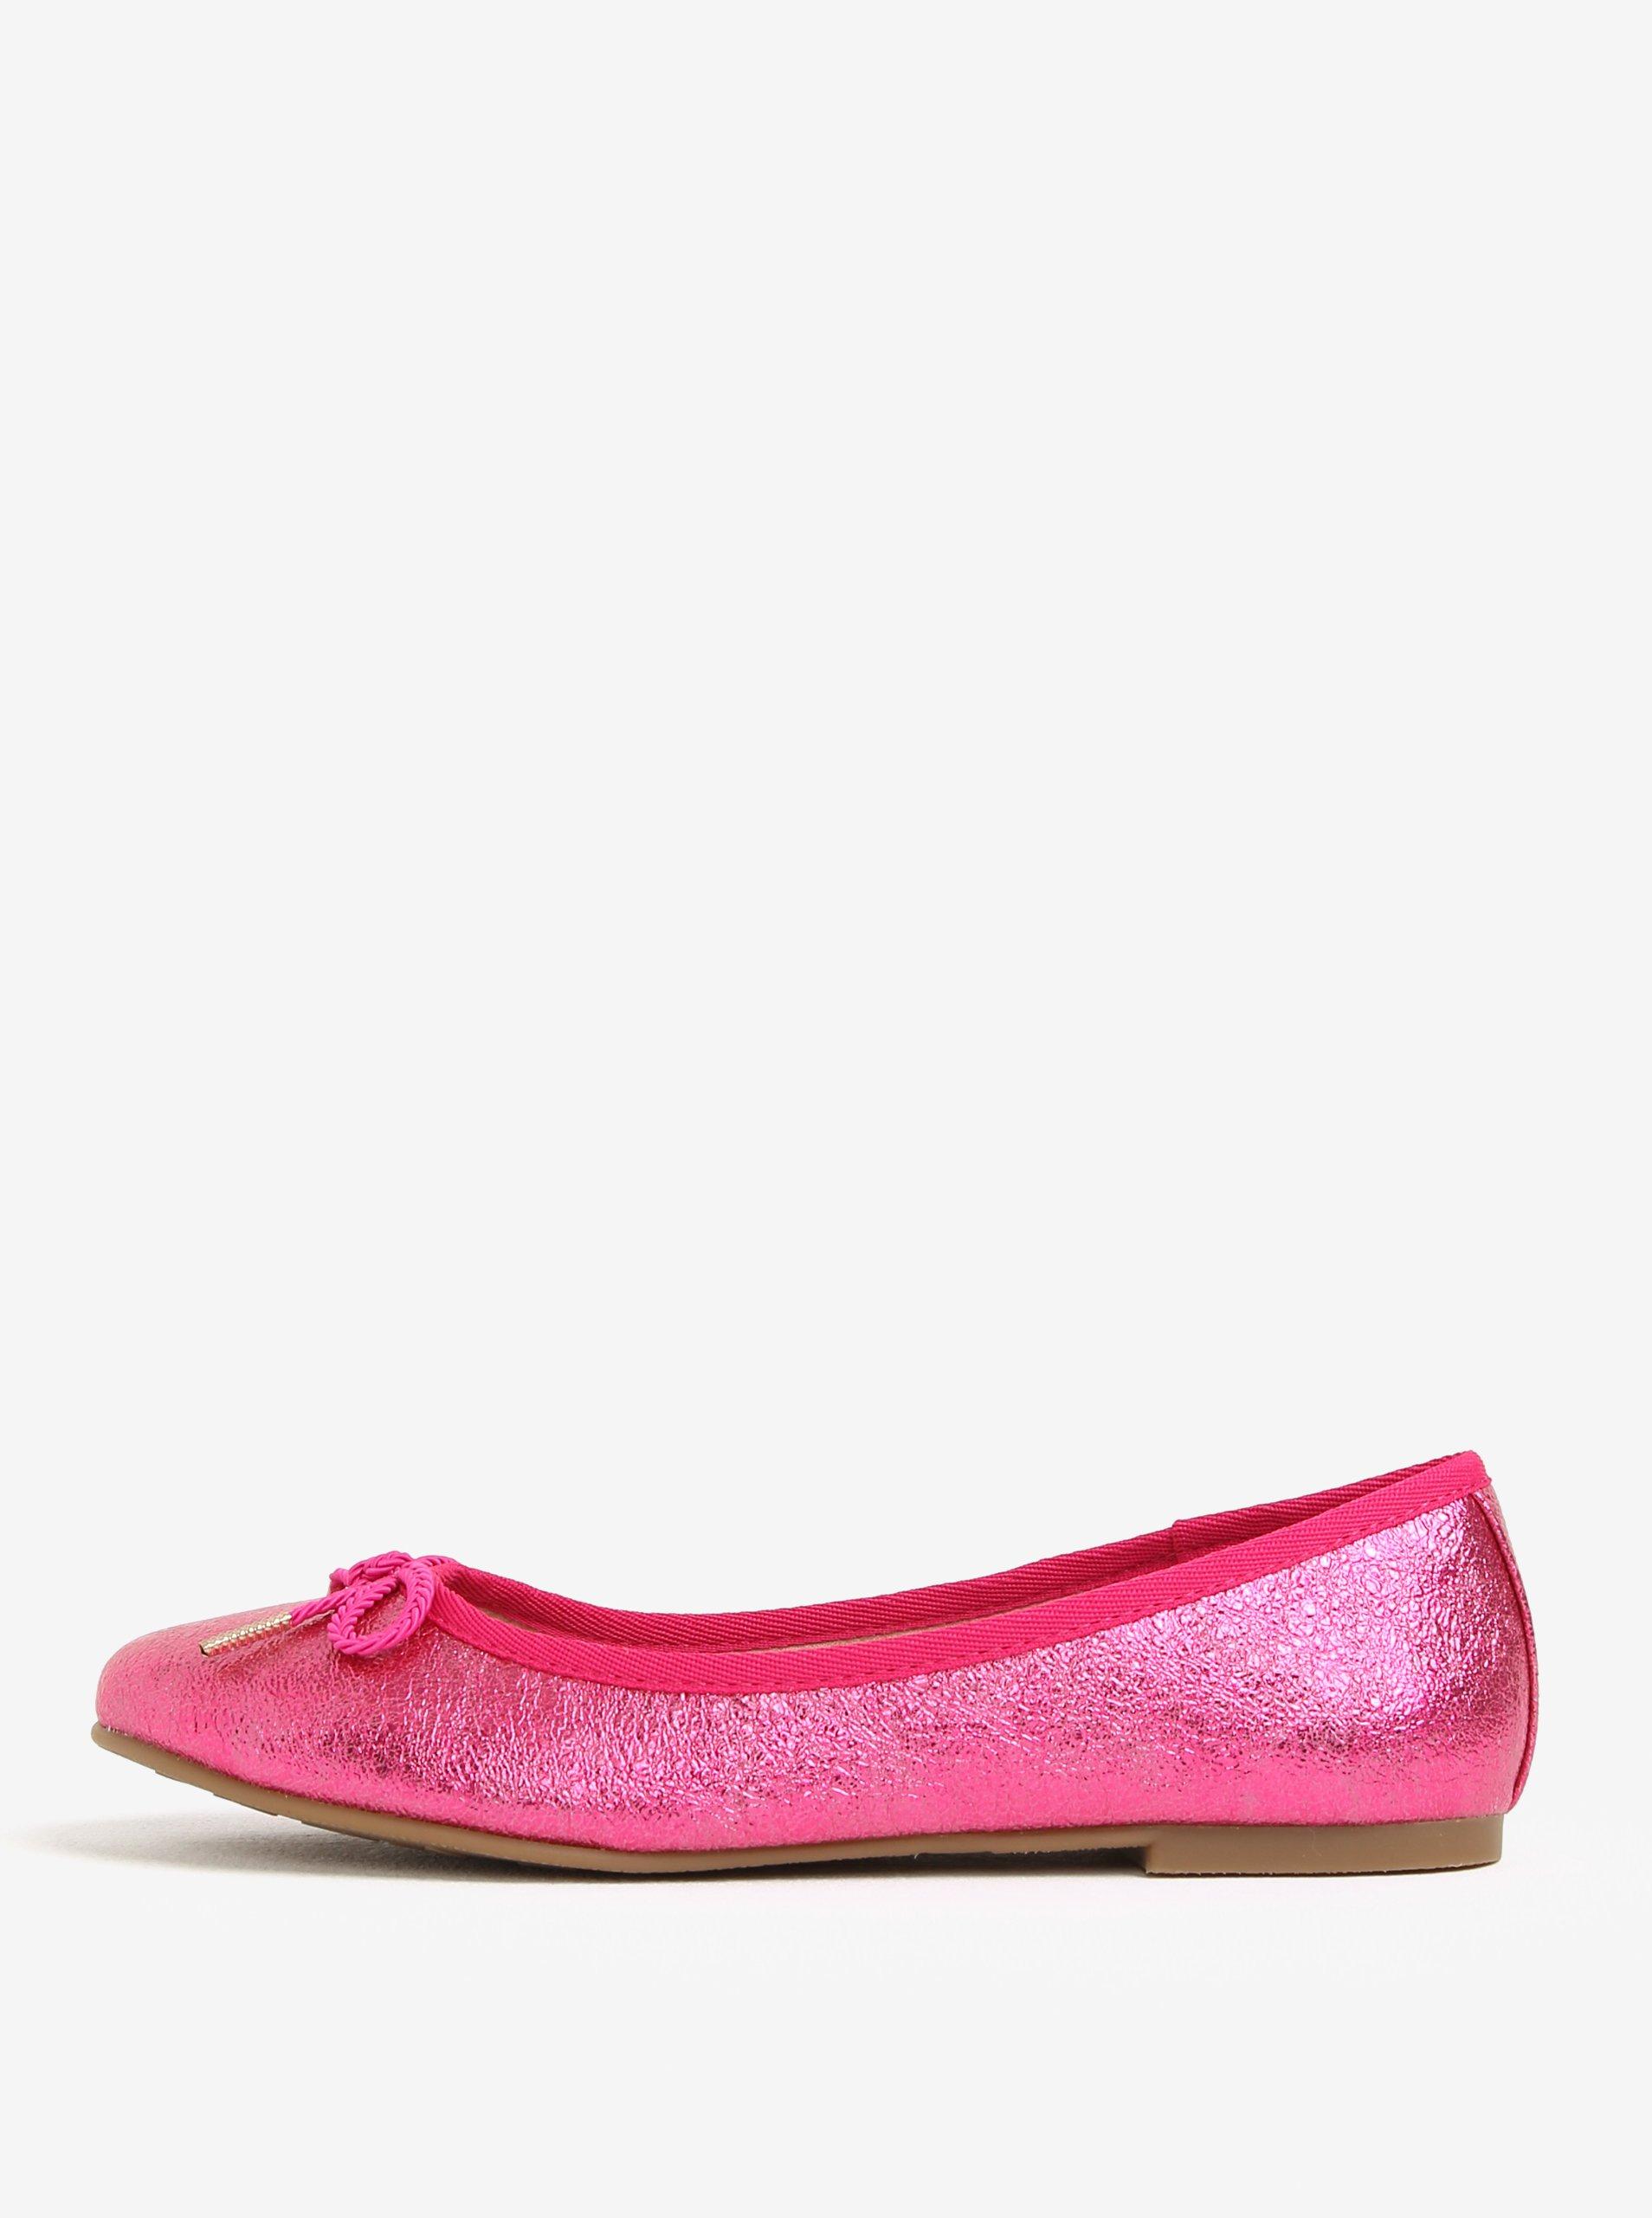 Růžové lesklé baleríny s mašlí Tamaris